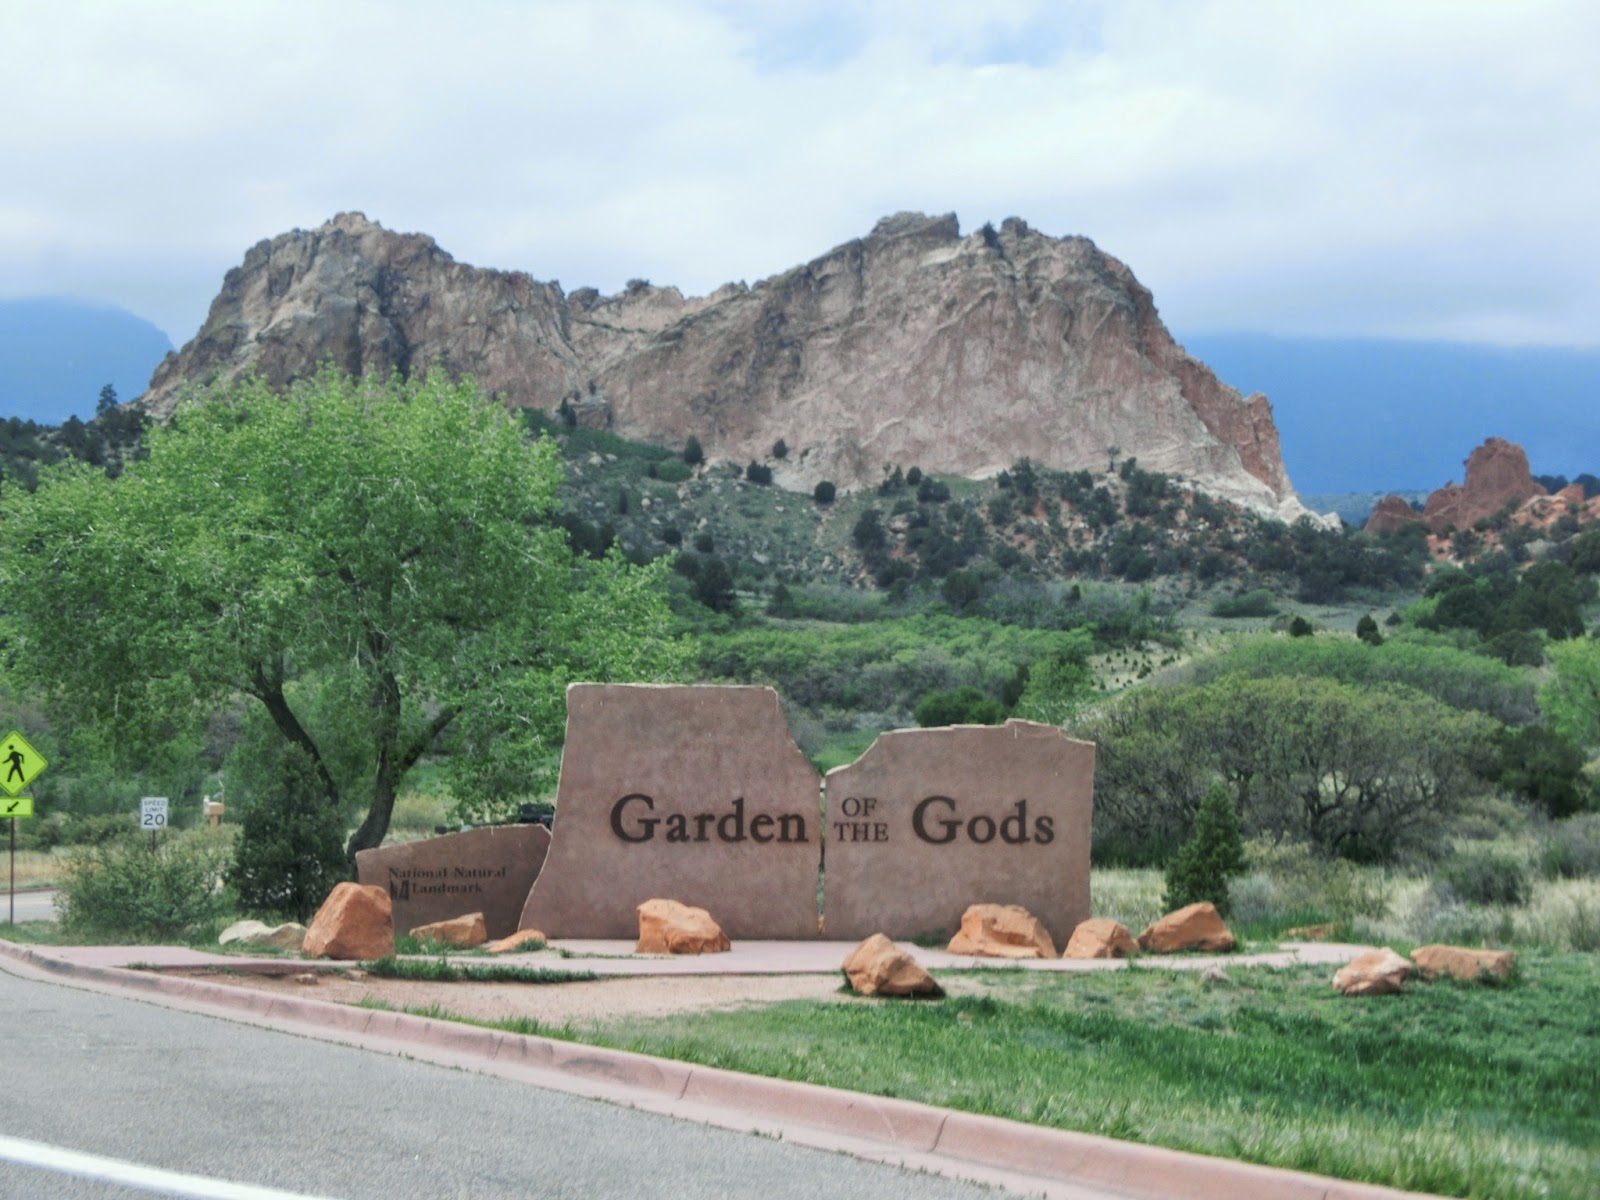 Colorado springs co garden of the gods hike explore this city for Garden of the gods hiking trails